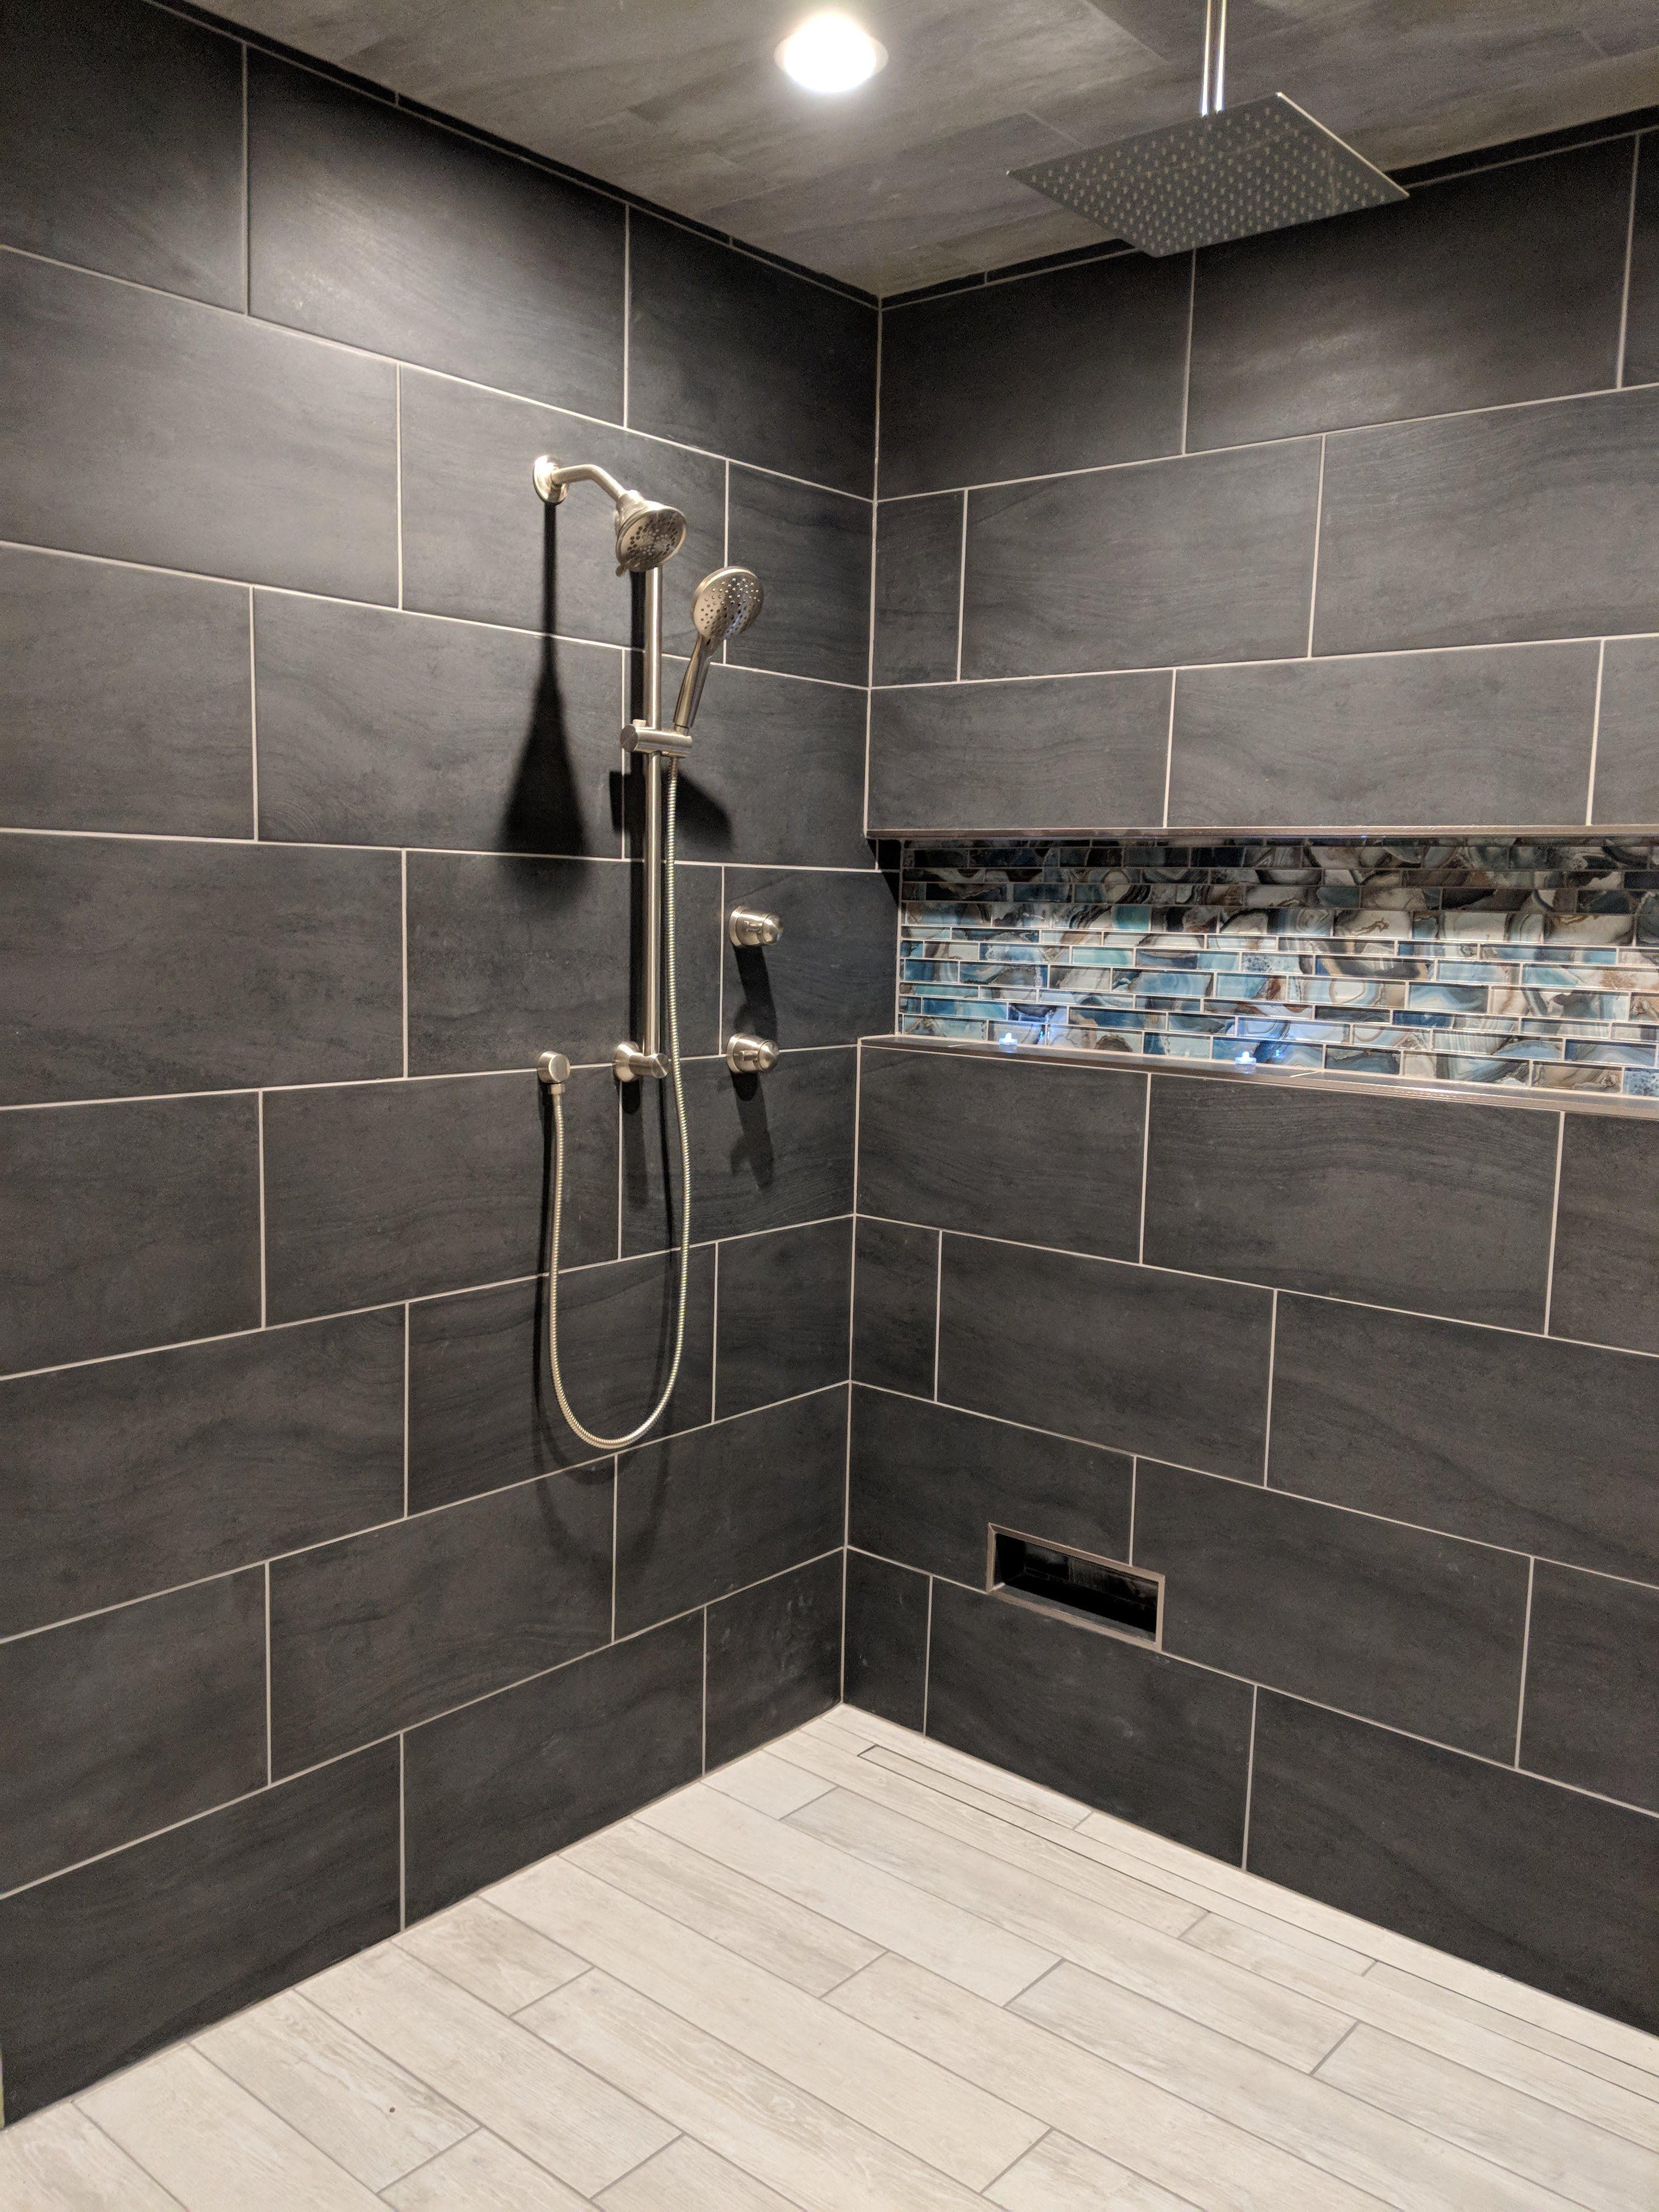 Moen Fixtures Rothbury Valve Wall Tile Nova Bella Crossover Nero Tile Ceiling Nova Bella Crossover Argento Niche Magical Fo Shower Tile Renovations Design